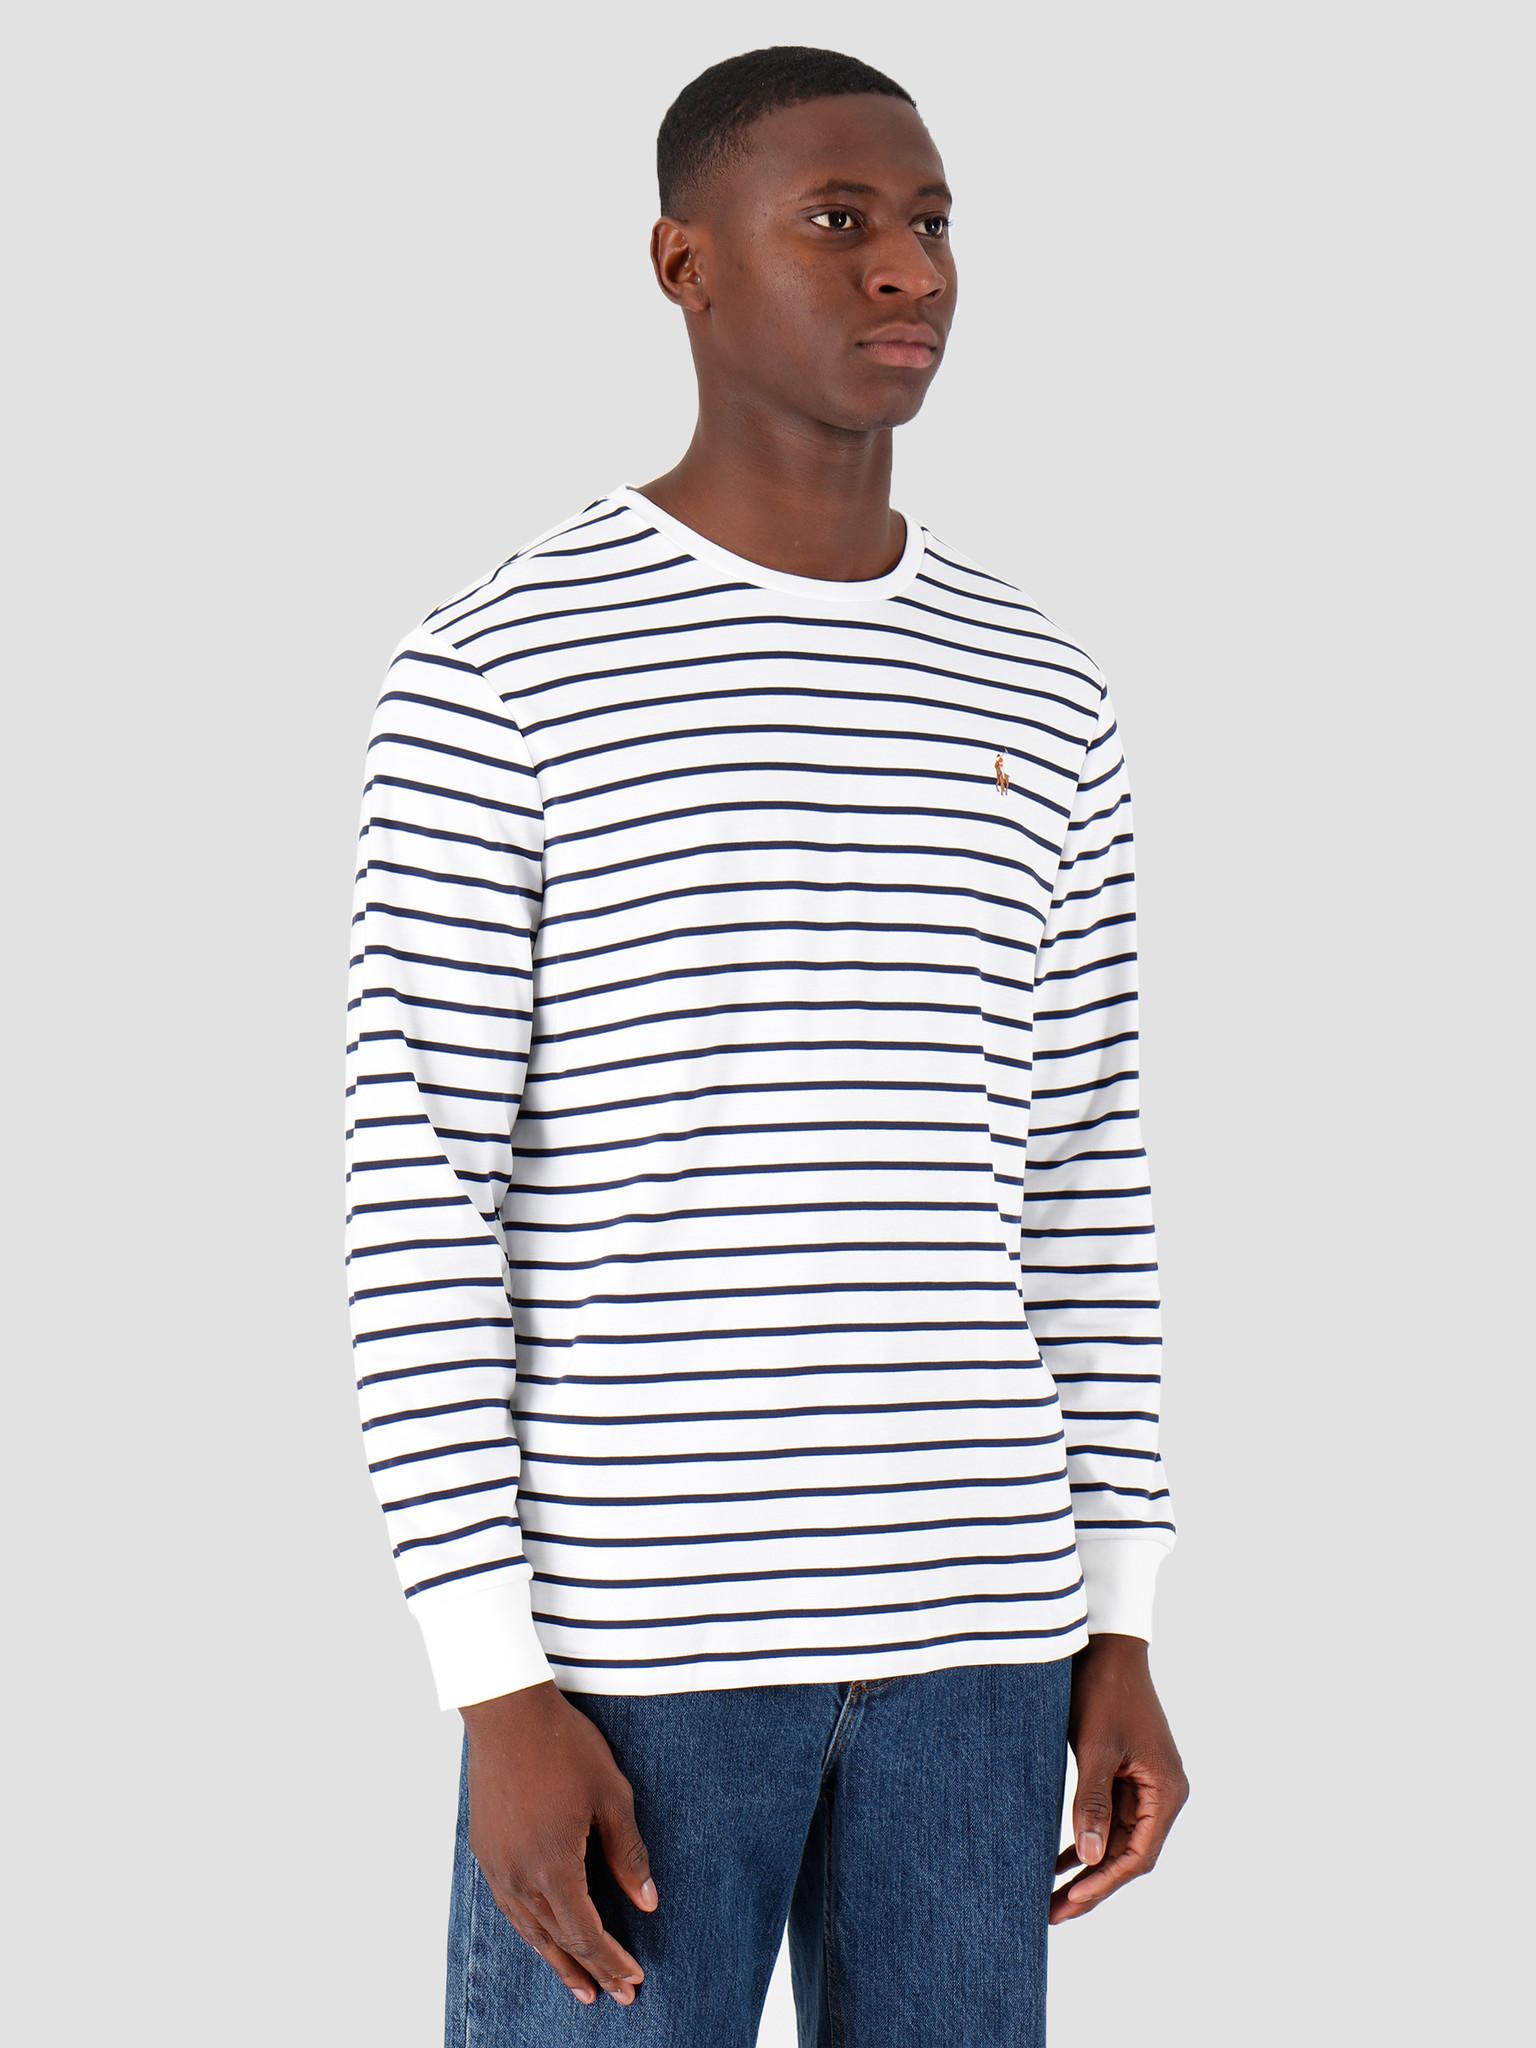 Polo Ralph Lauren Polo Ralph Lauren Lsydcncmslm3 Longsleeve Tshirt White 710760122002